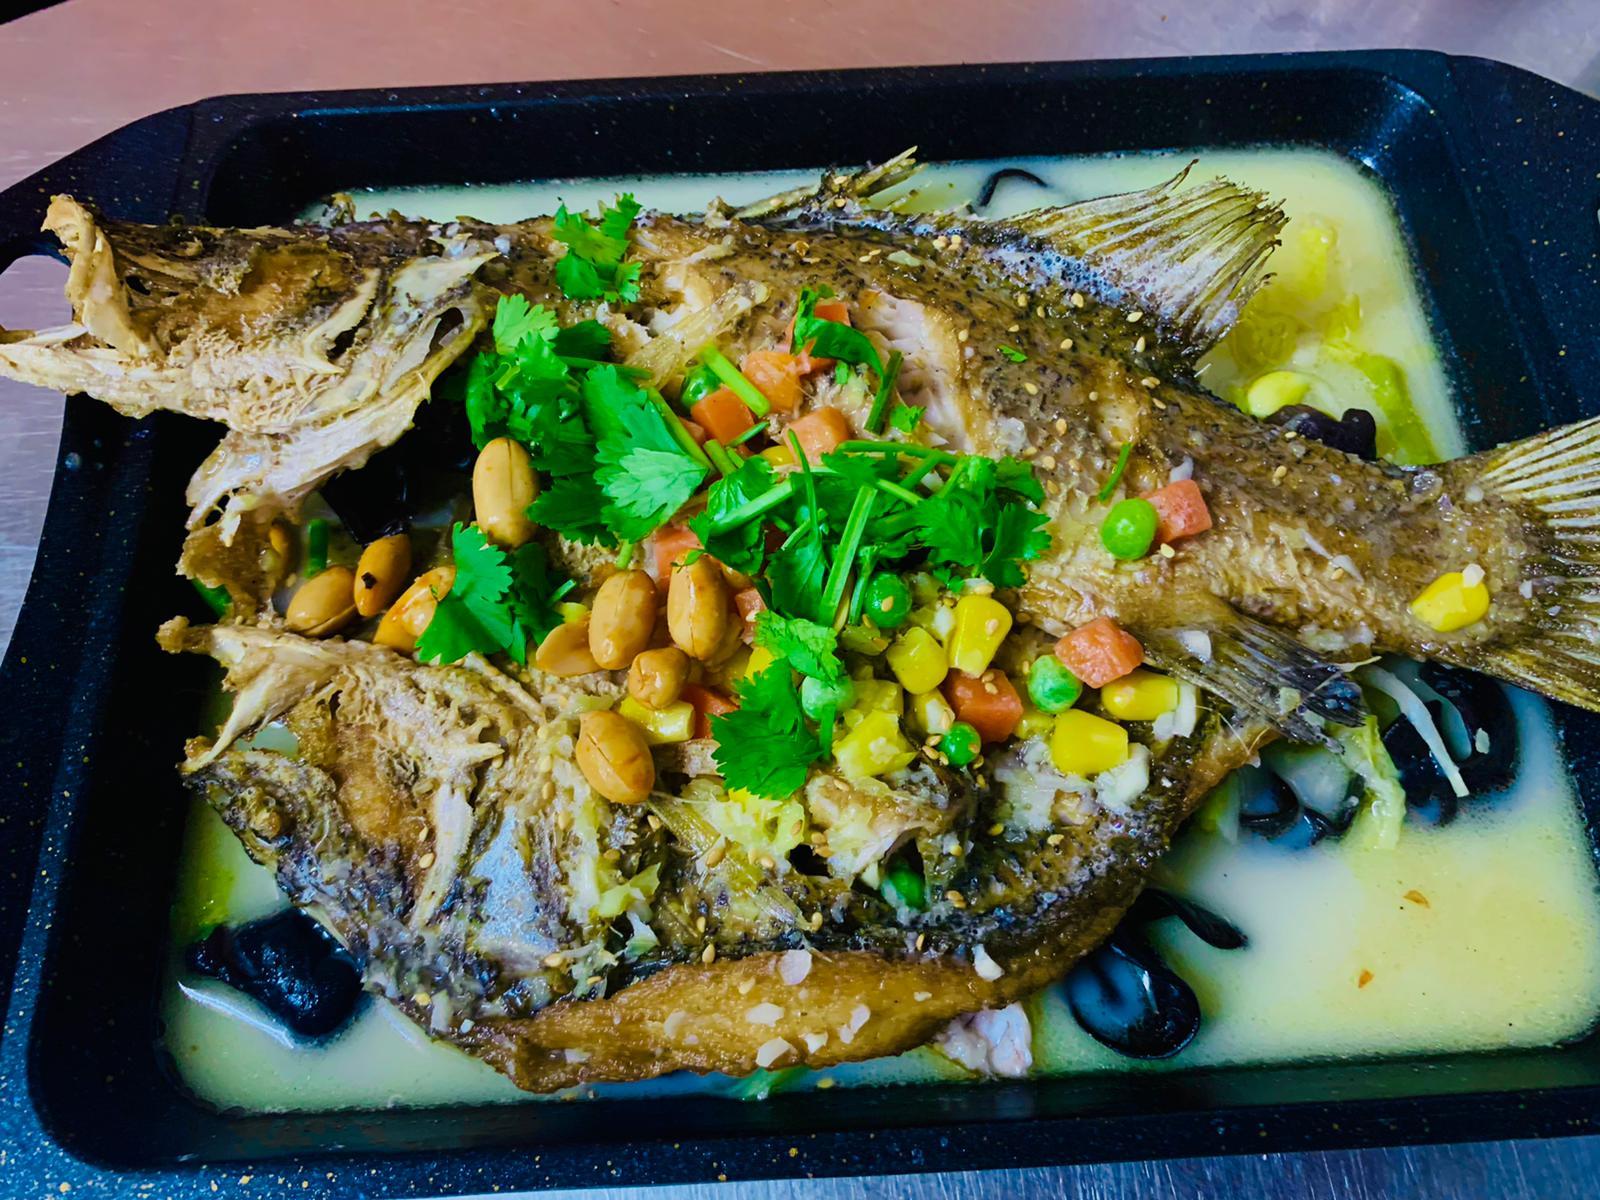 Ju Bao Xuan Mala Hotpot - healthy herbal grilled fish